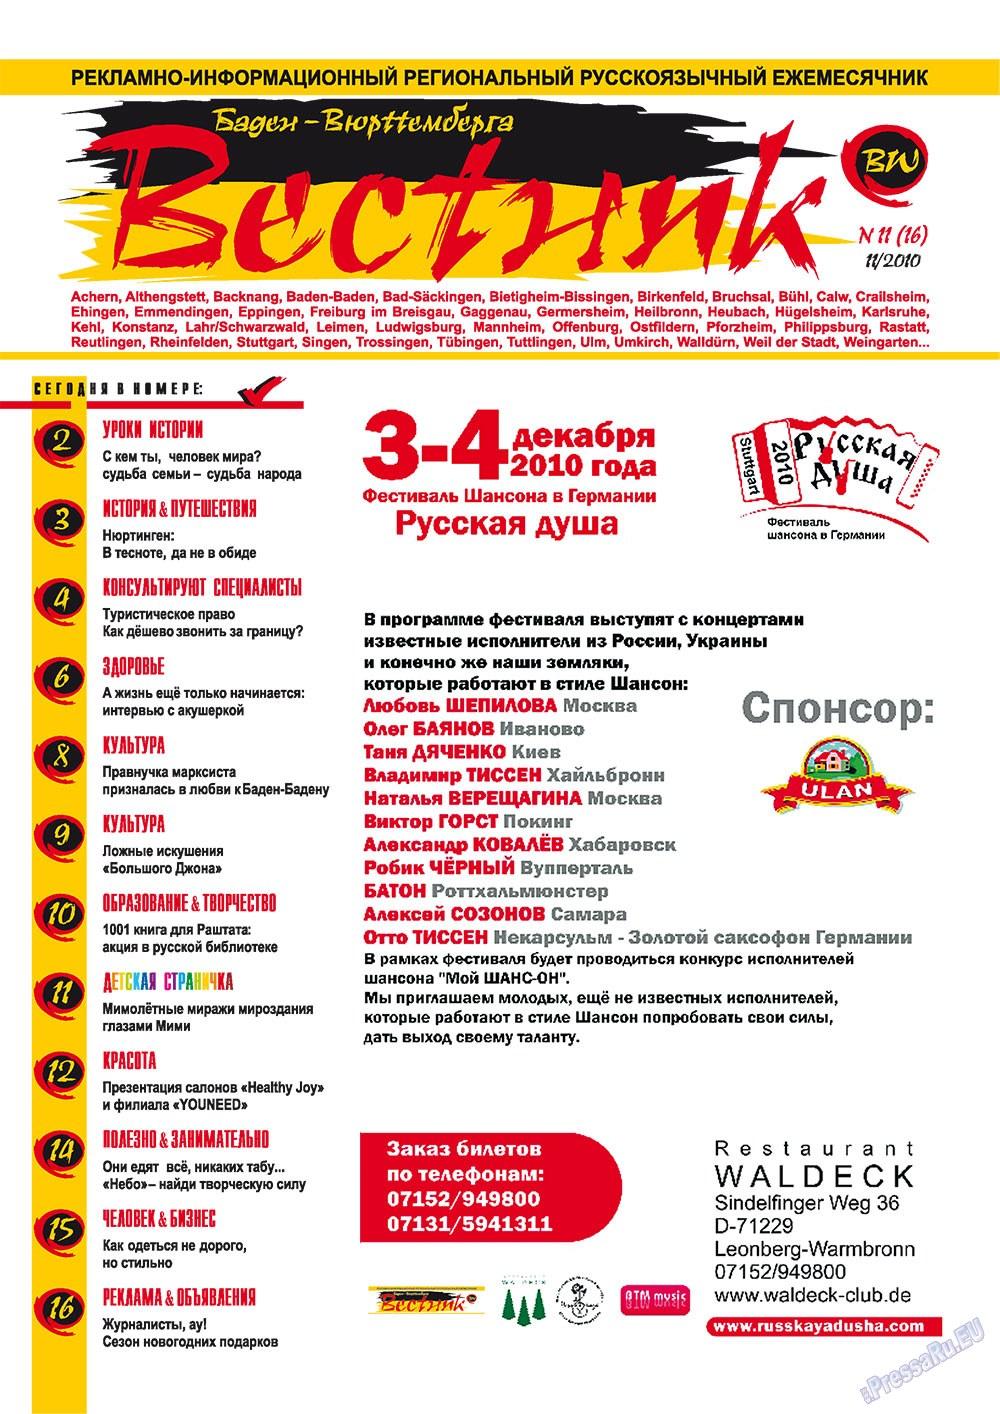 Вестник-info (журнал). 2010 год, номер 11, стр. 1